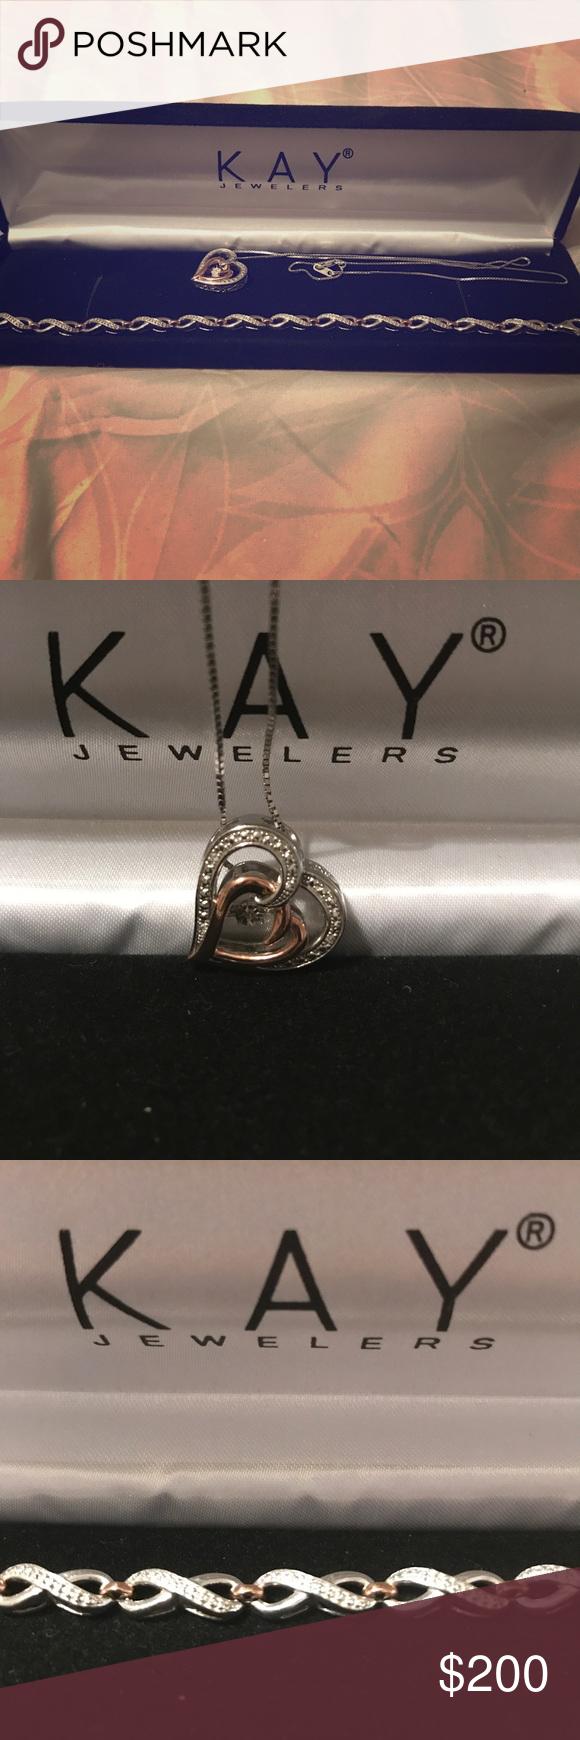 Kay jewelers necklace u tennis bracelet set necklace u tennis